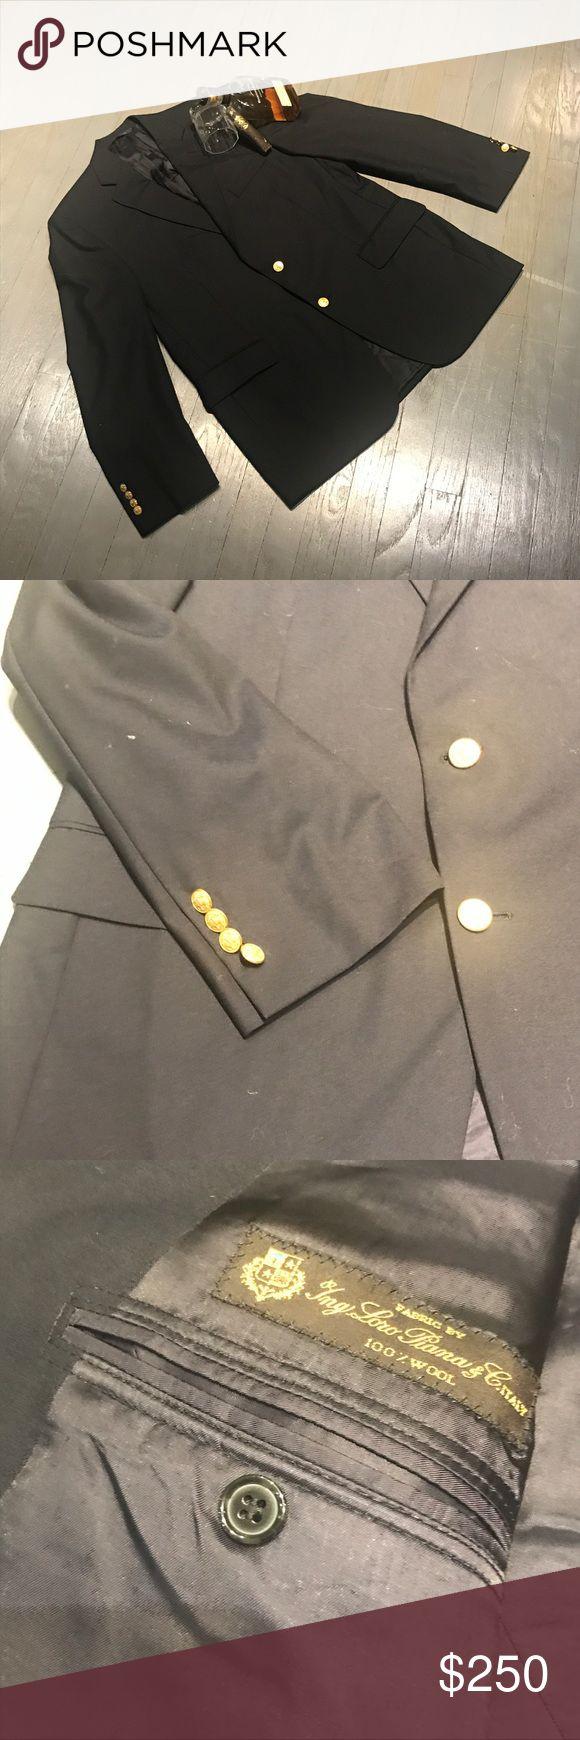 Brooks Brothers 1818 Madison Gold Button Blazer Brooks Brothers 1818 Madison Navy Blue Gold Button Blazer Brooks Brothers Suits & Blazers Sport Coats & Blazers